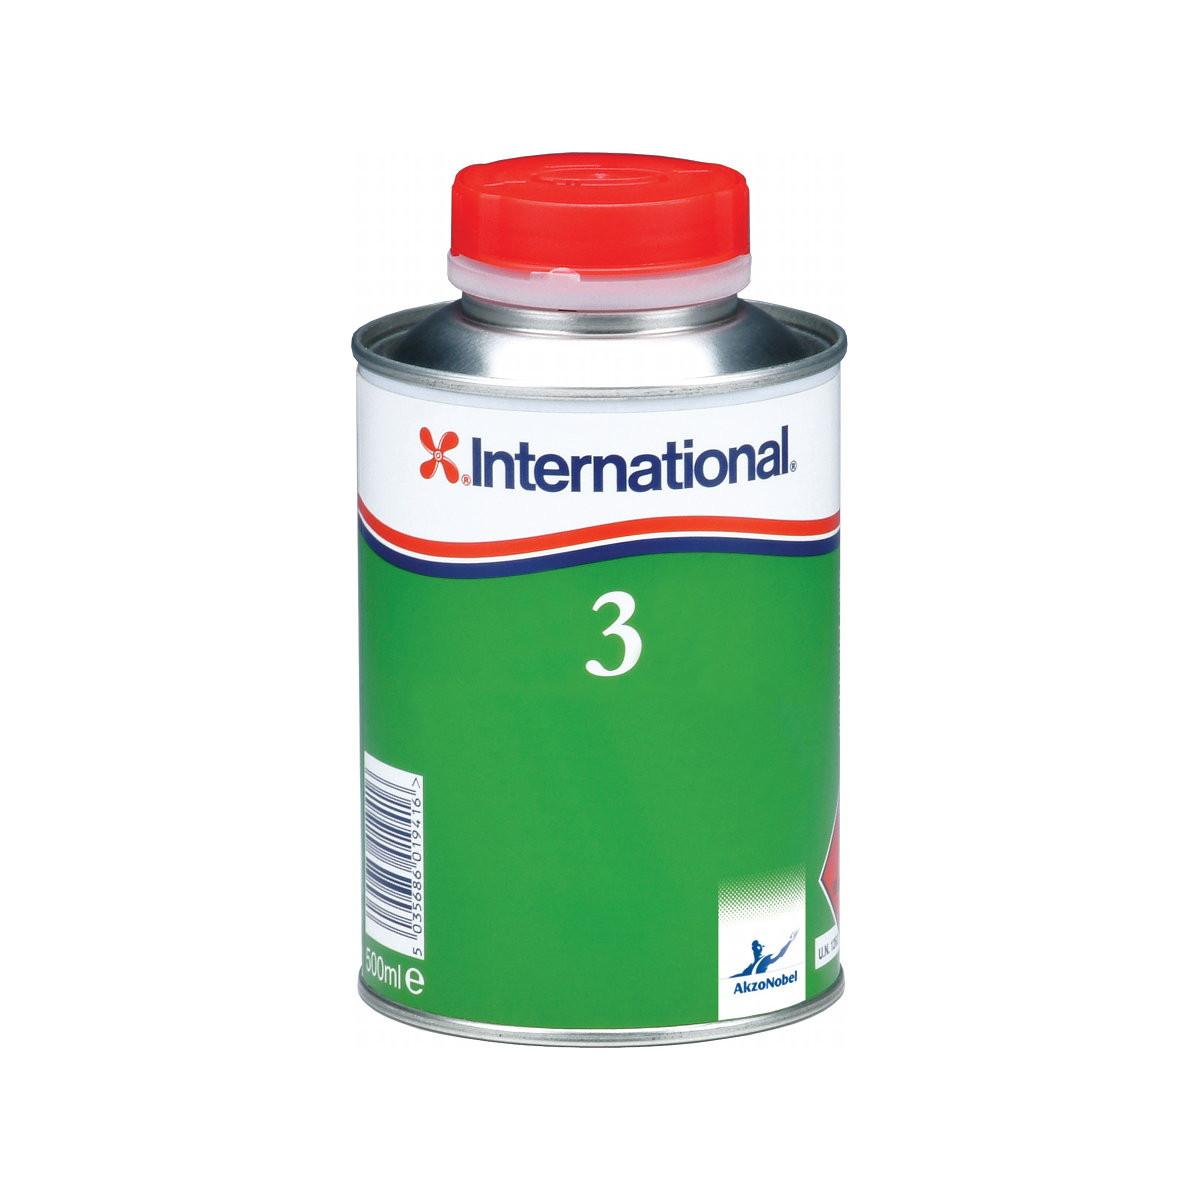 International Thinner verdunning No.3 - 0,5l/500ml